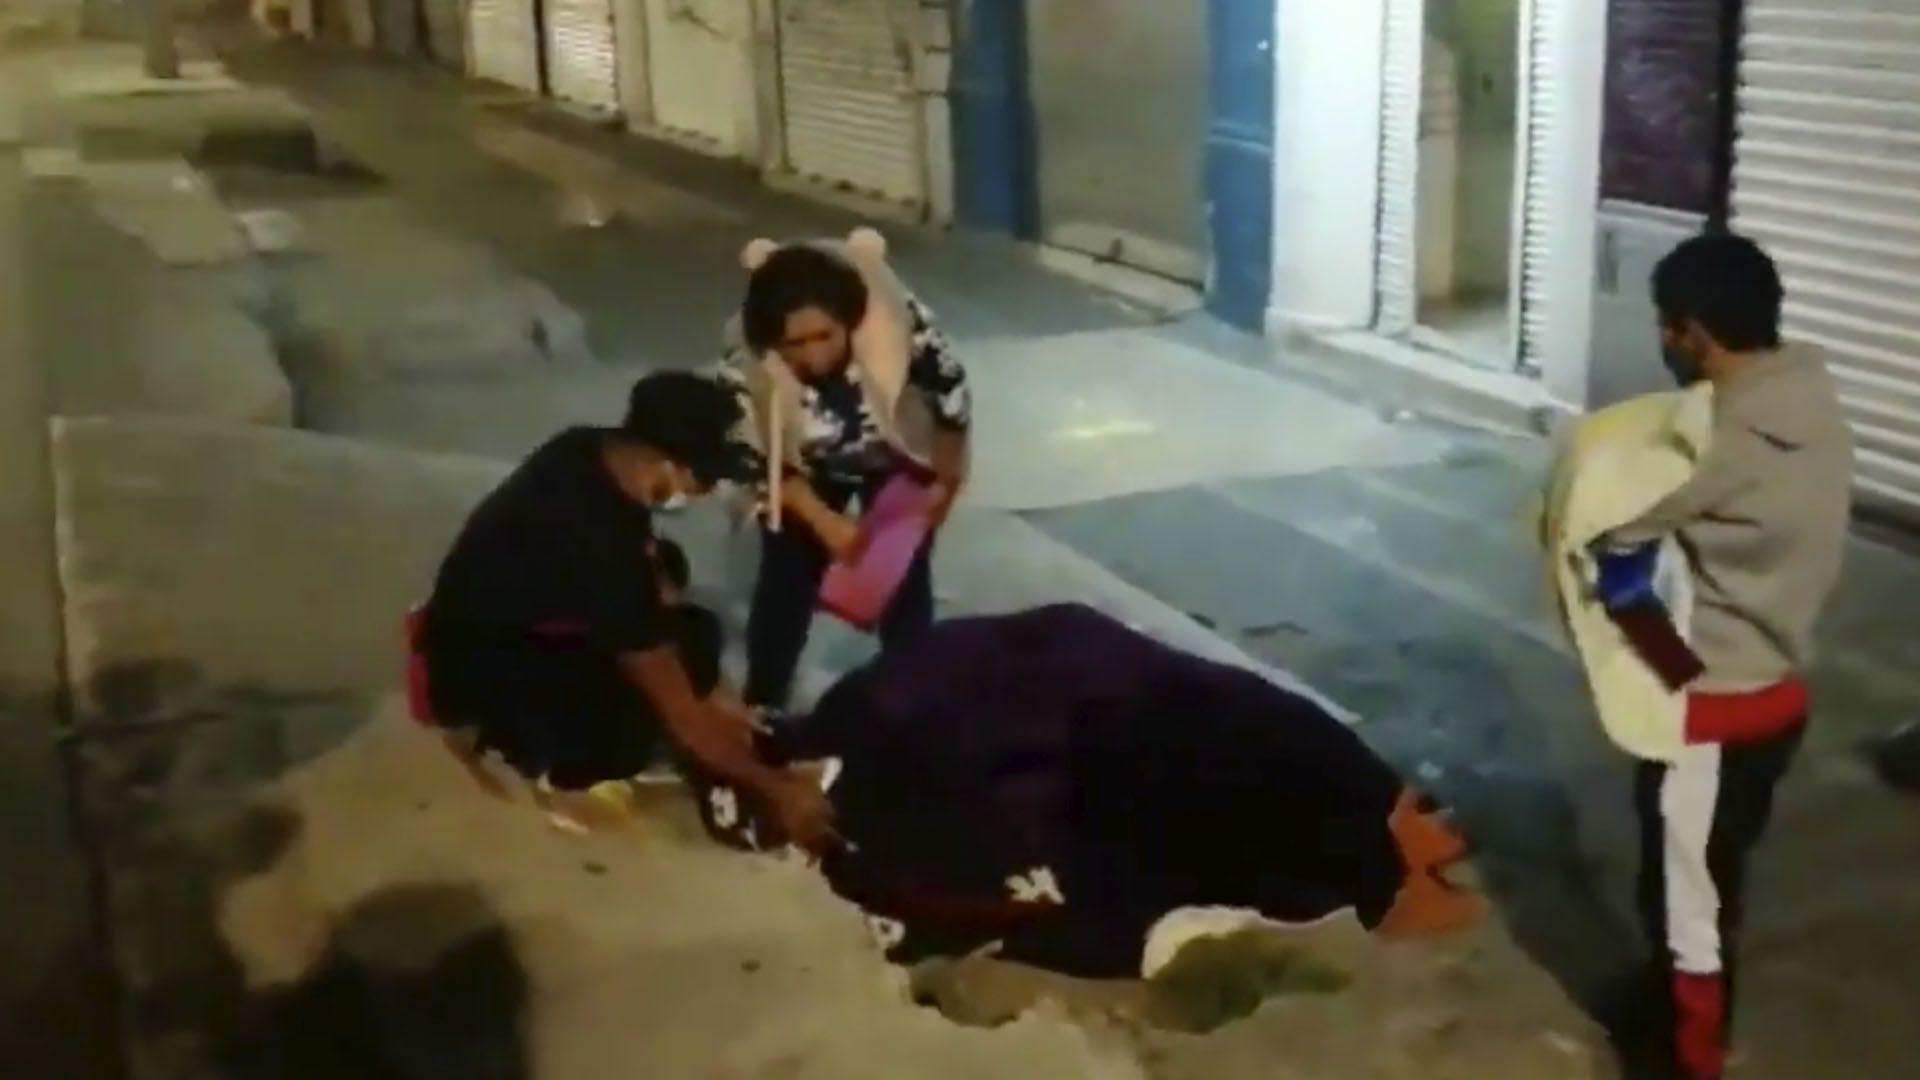 Nace bebé en las calles de la CDMX (Foto: captura de pantalla twitter@imagenYuri)